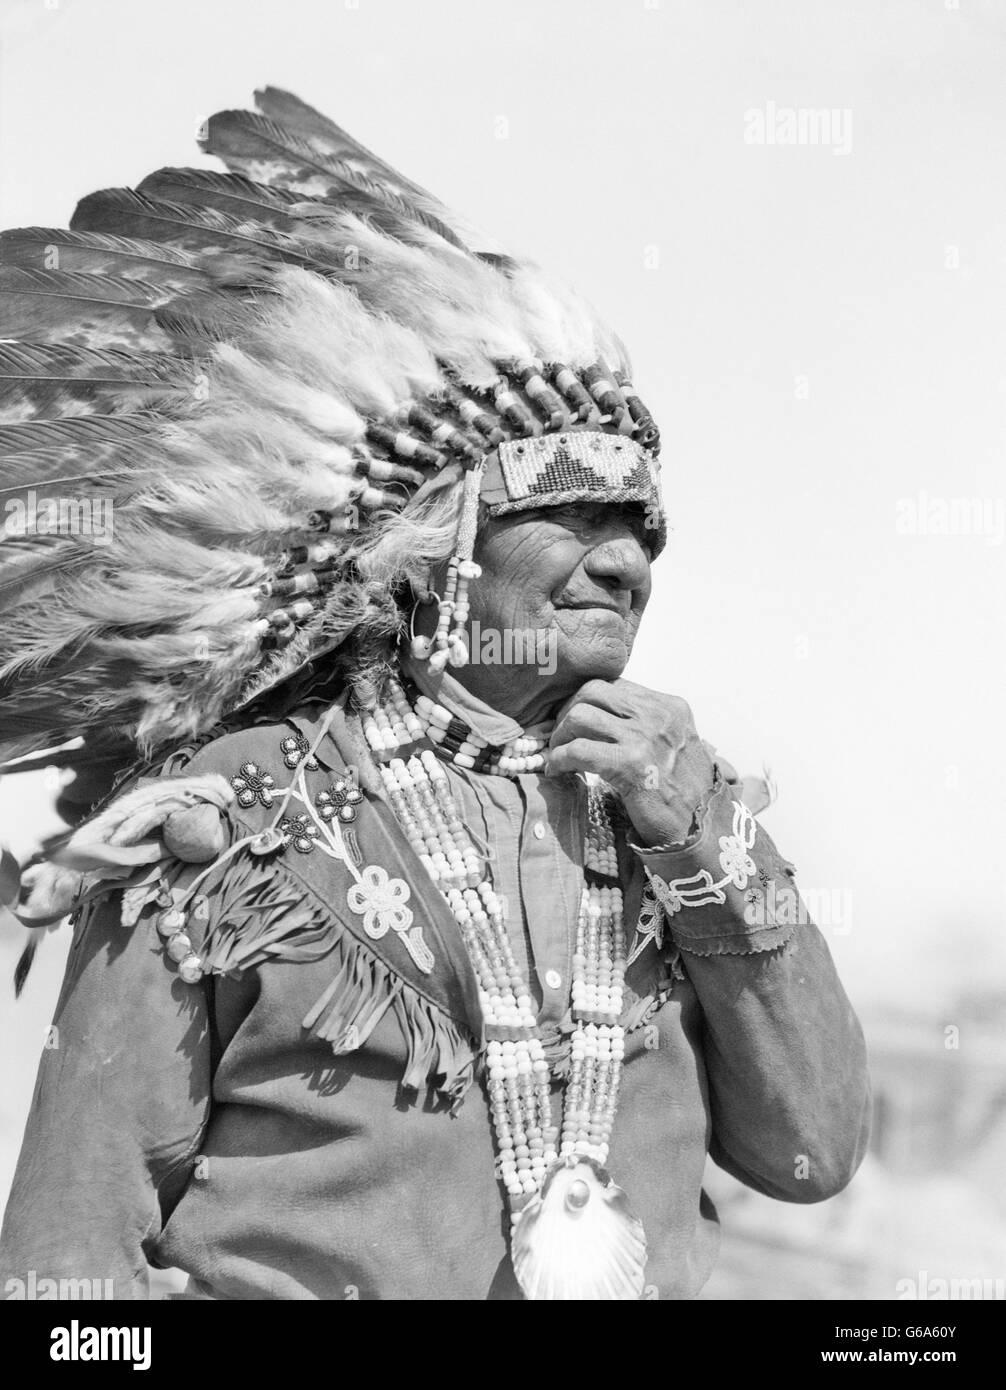 1930s NATIVE AMERICAN MAN CHIEF WEARING FULL FEATHERED HEADDRESS BEADED COSTUME SANTA CLARA PUEBLO NEW MEXICO USA  sc 1 st  Alamy & 1930s NATIVE AMERICAN MAN CHIEF WEARING FULL FEATHERED HEADDRESS ...